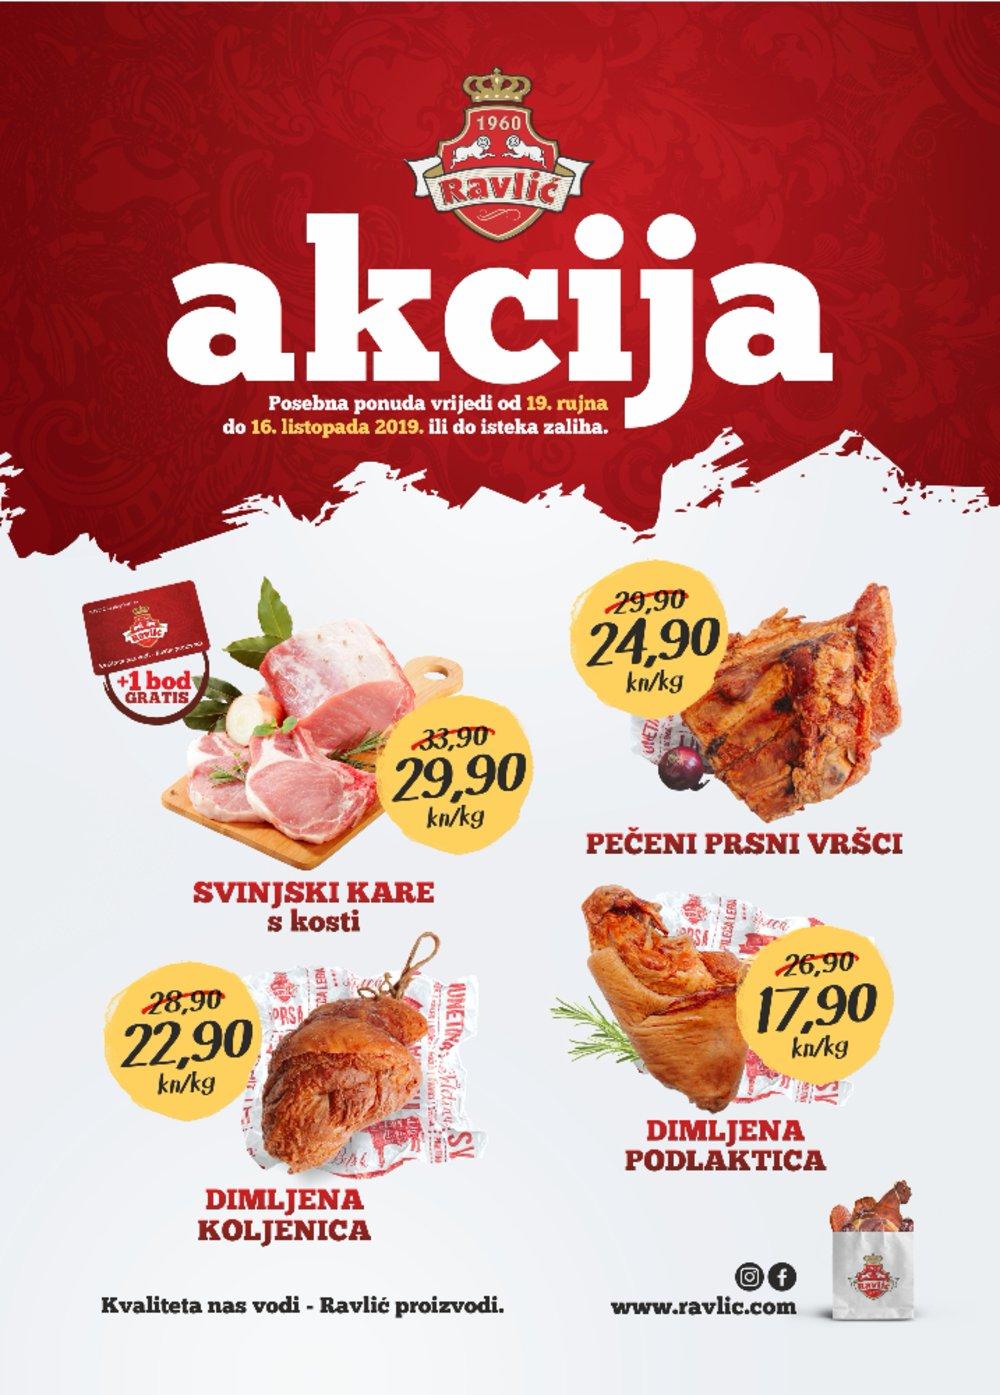 Ravlić letak Akcija 19.09.-16.10.2019.